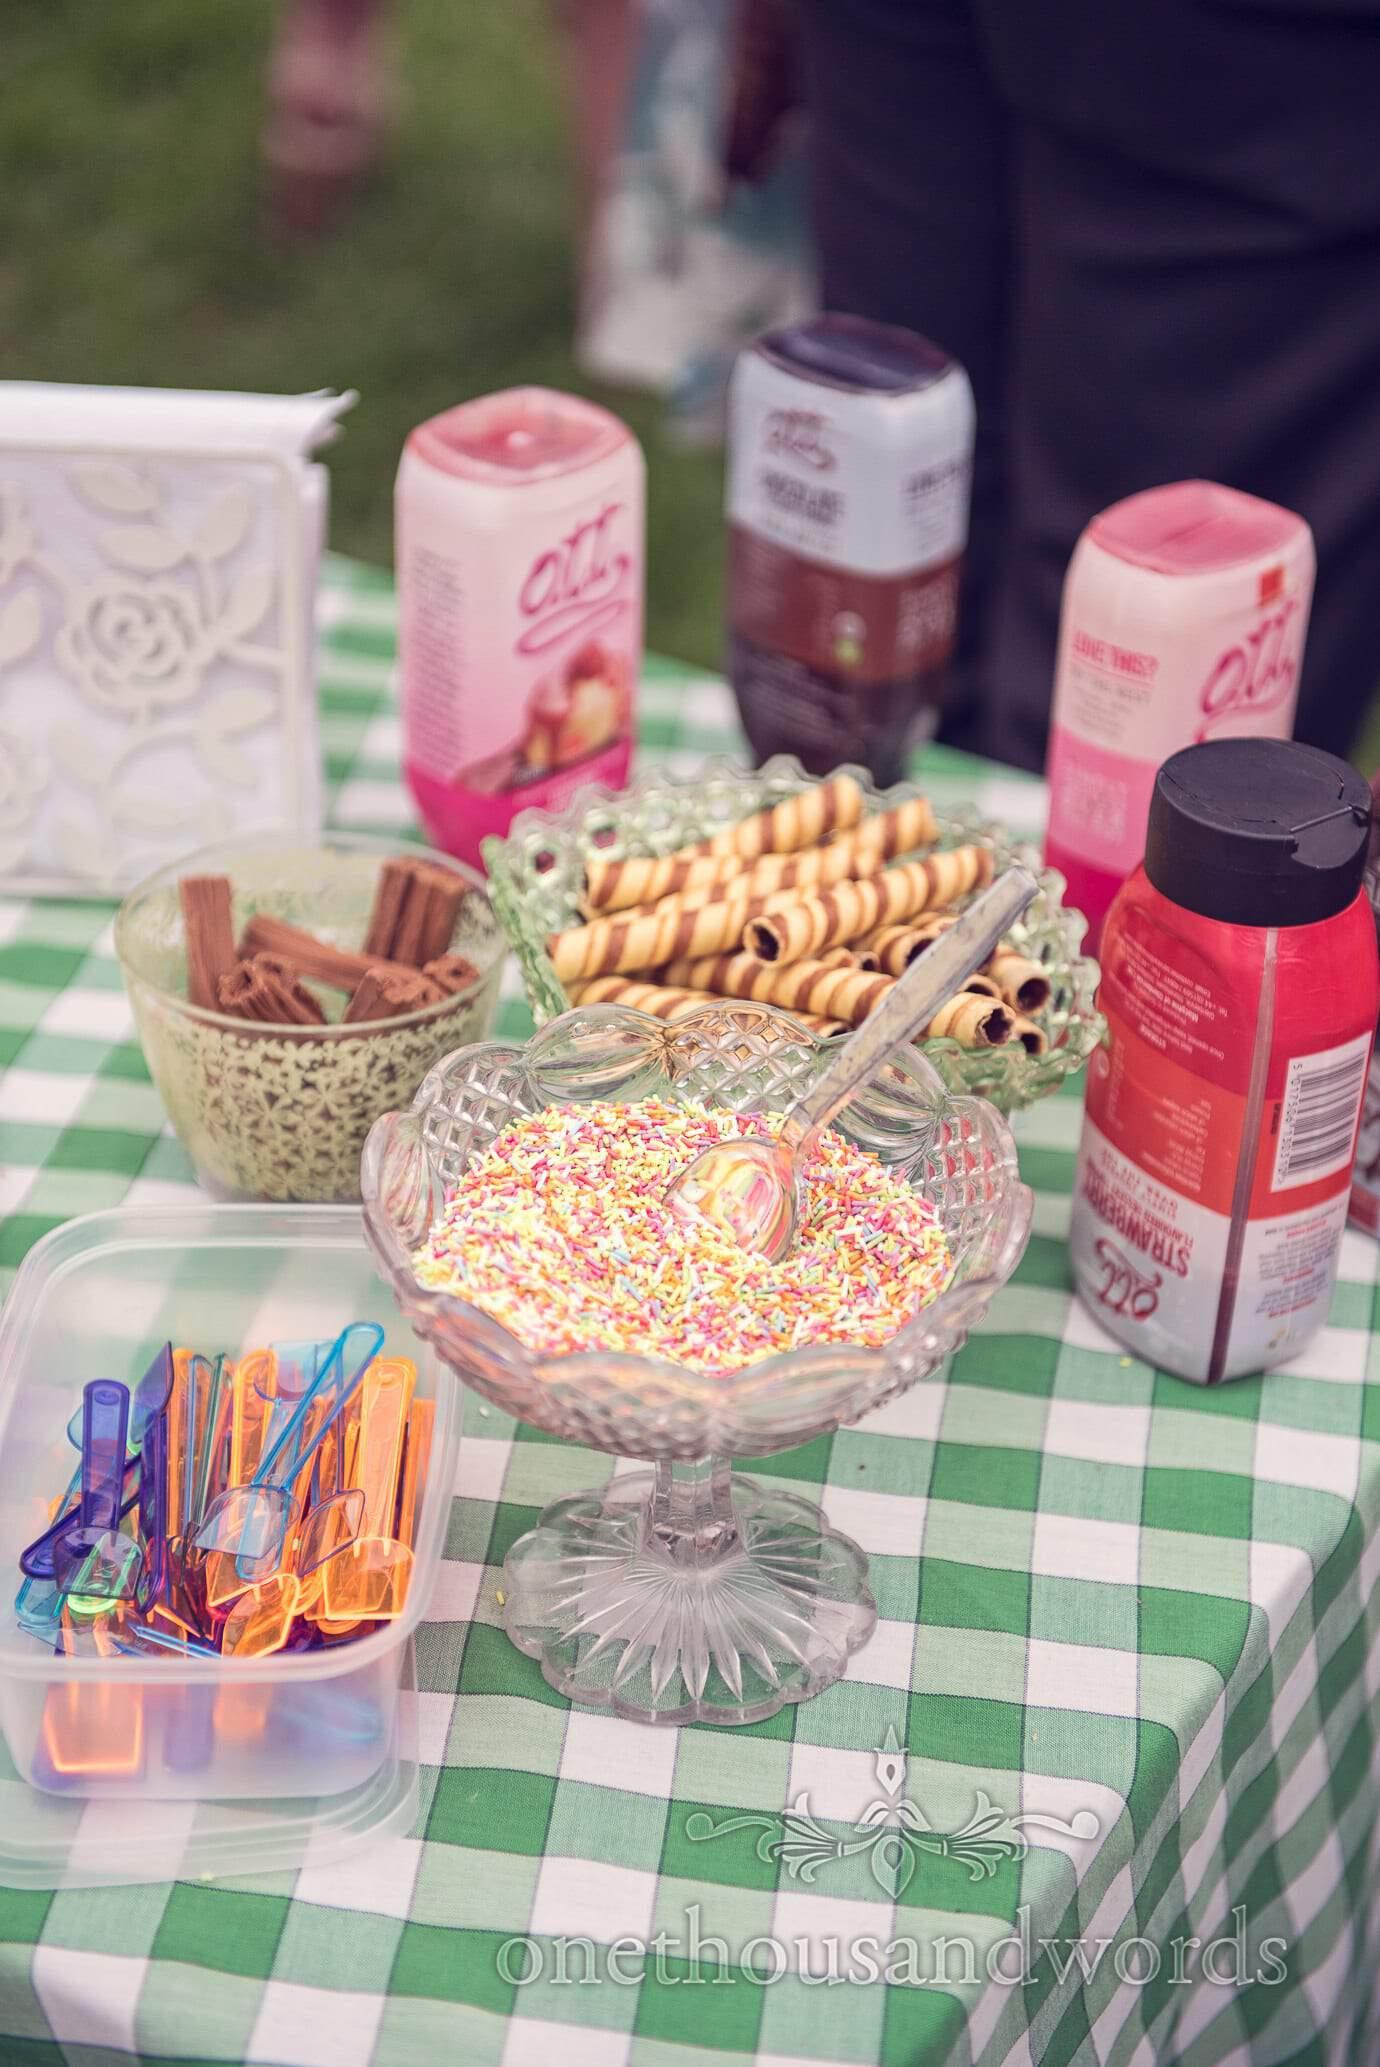 Wedding ice cream sprinkles and sauces at Wareham wedding